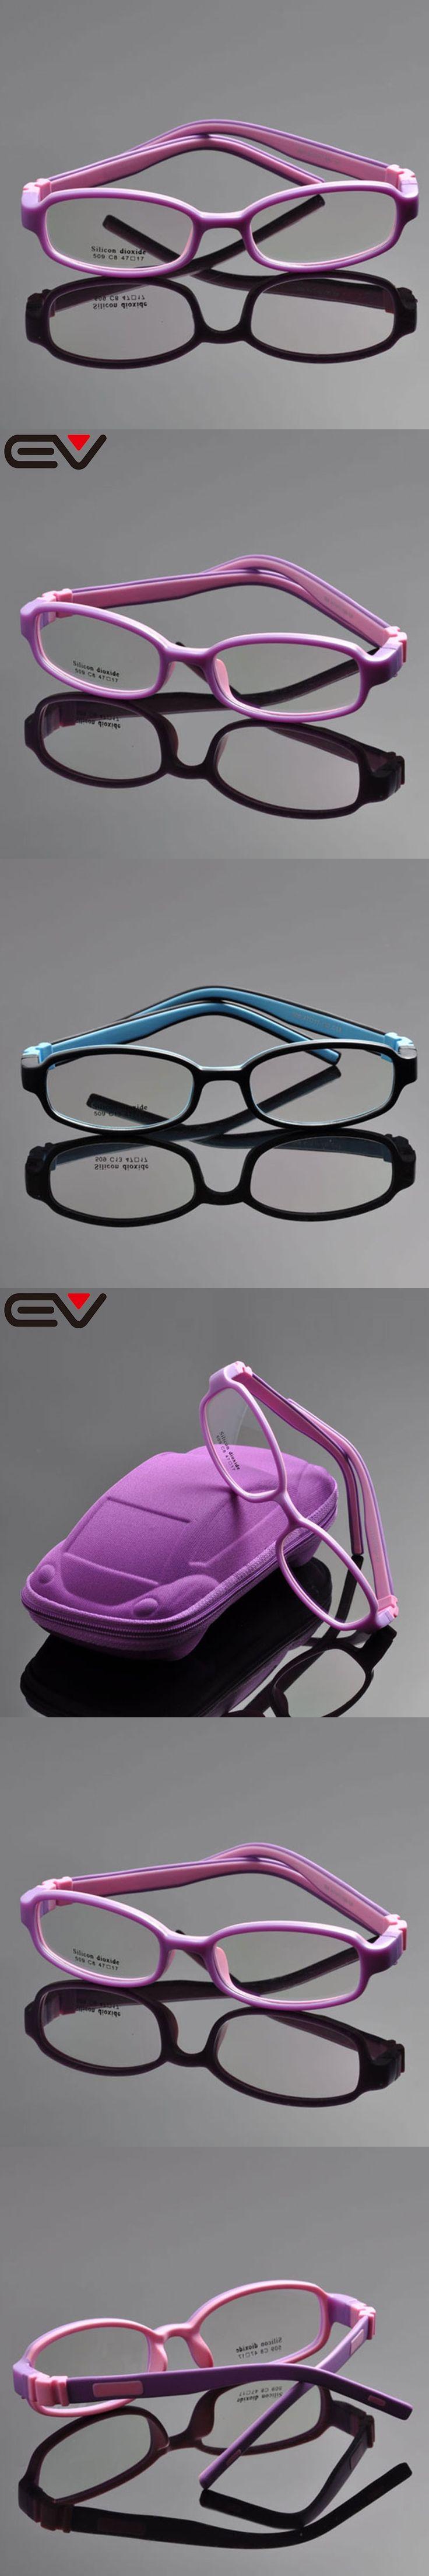 Optical frame for kids glasses frame optical glasses for child  monturas de gafas high prescription glasses oculos sem EV0297